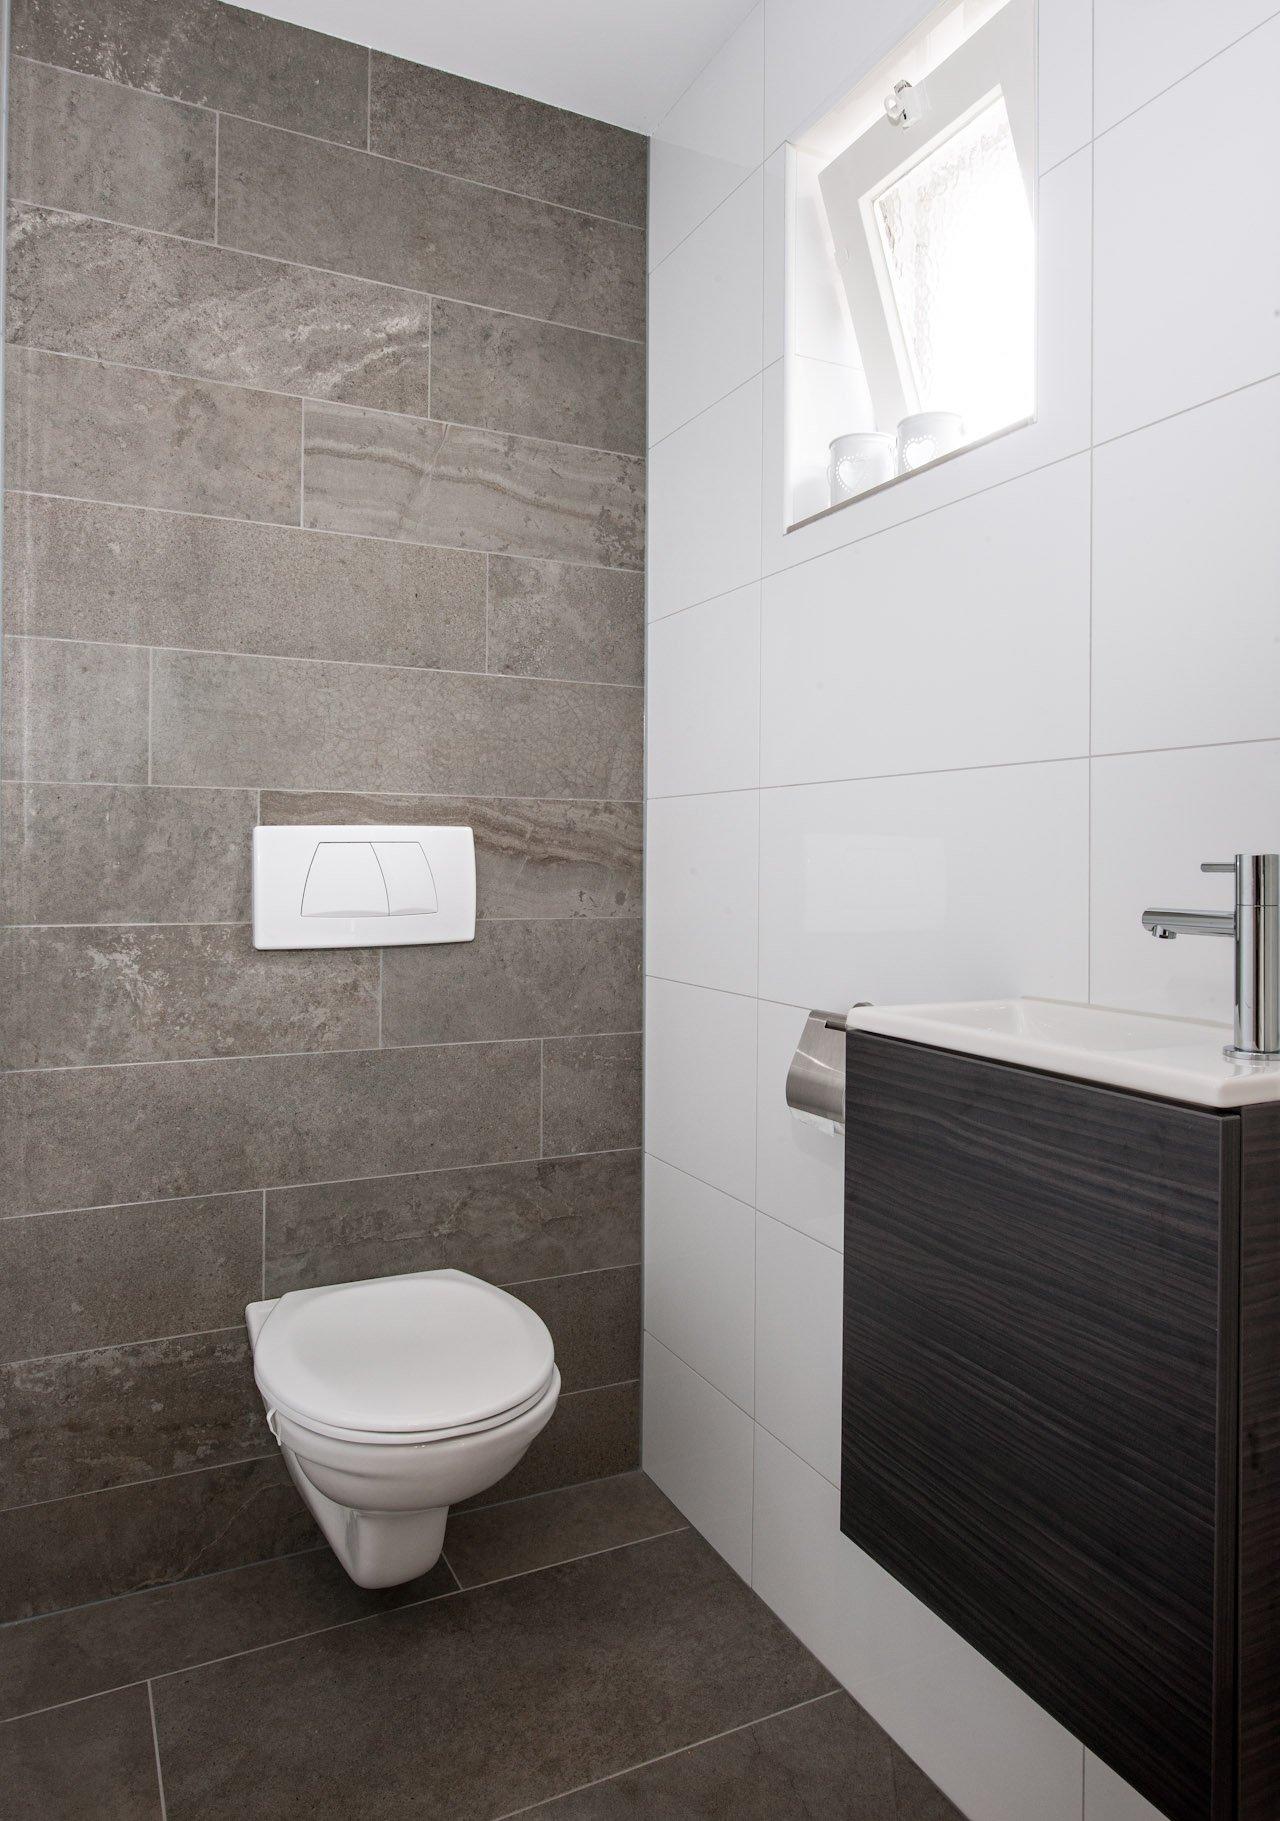 Groot formaat vloertegels in hal en badkamer kroon vloeren in steen - Badkamer wc ...